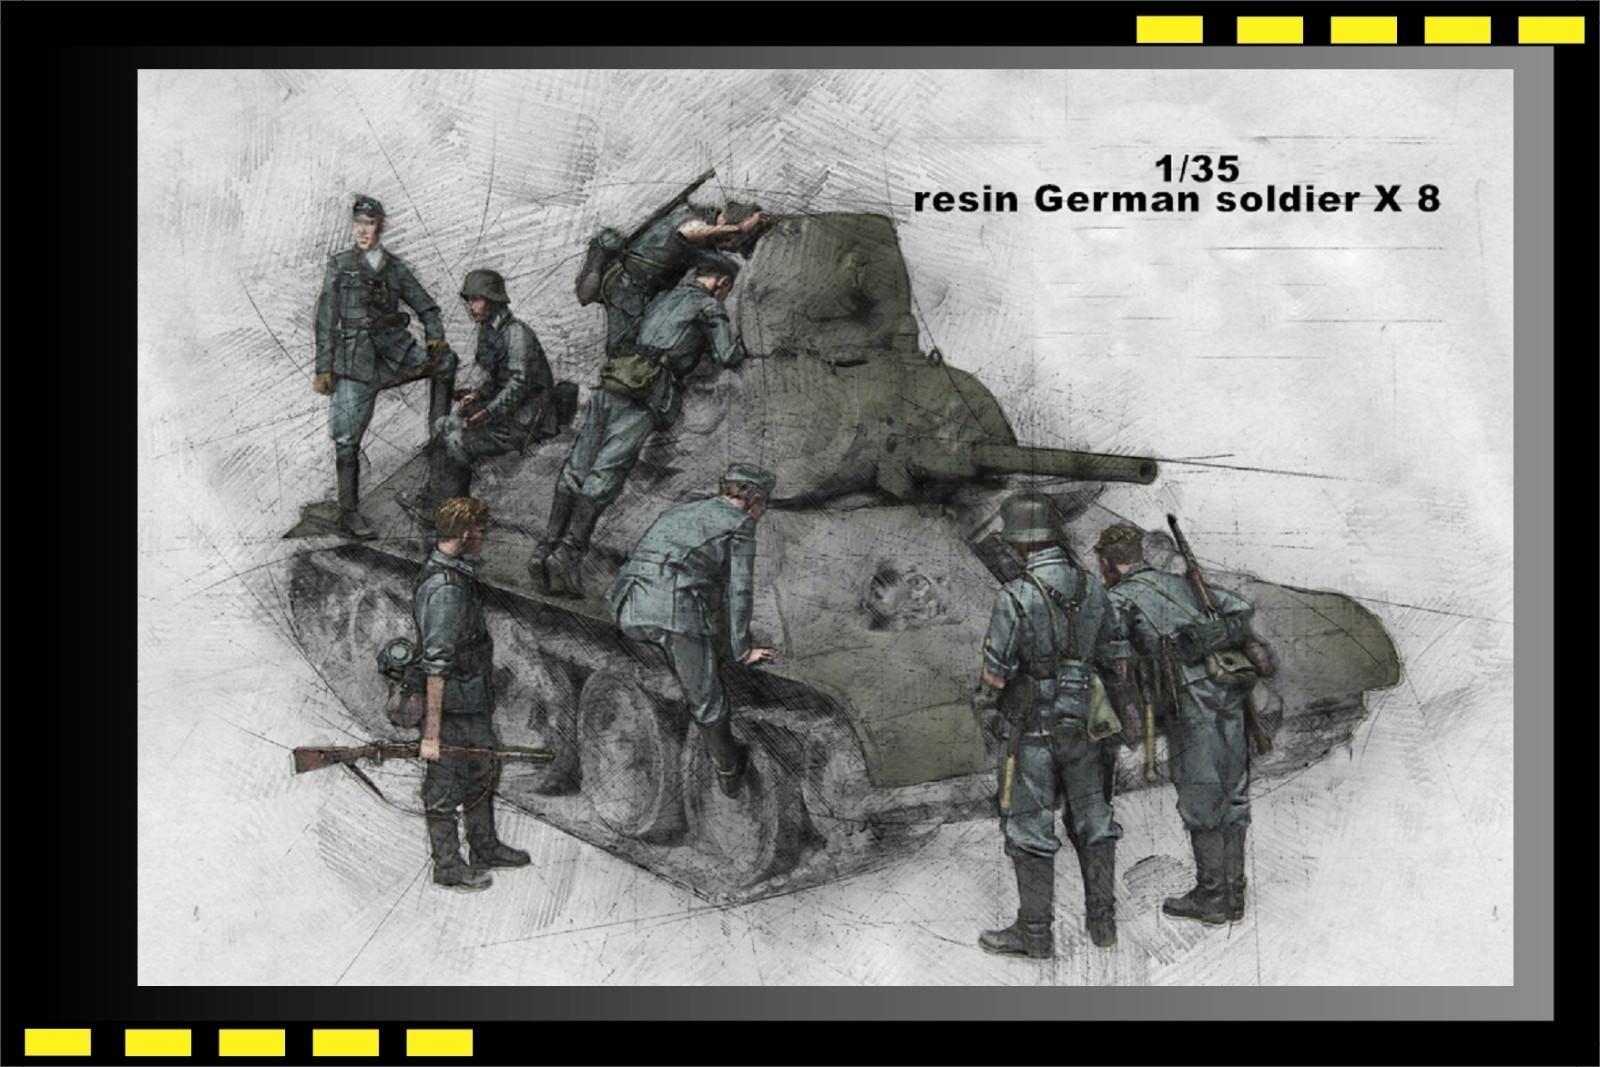 1 35 WWII German Soldier inspect T-34 1941 (8 resin figures) Fast bid